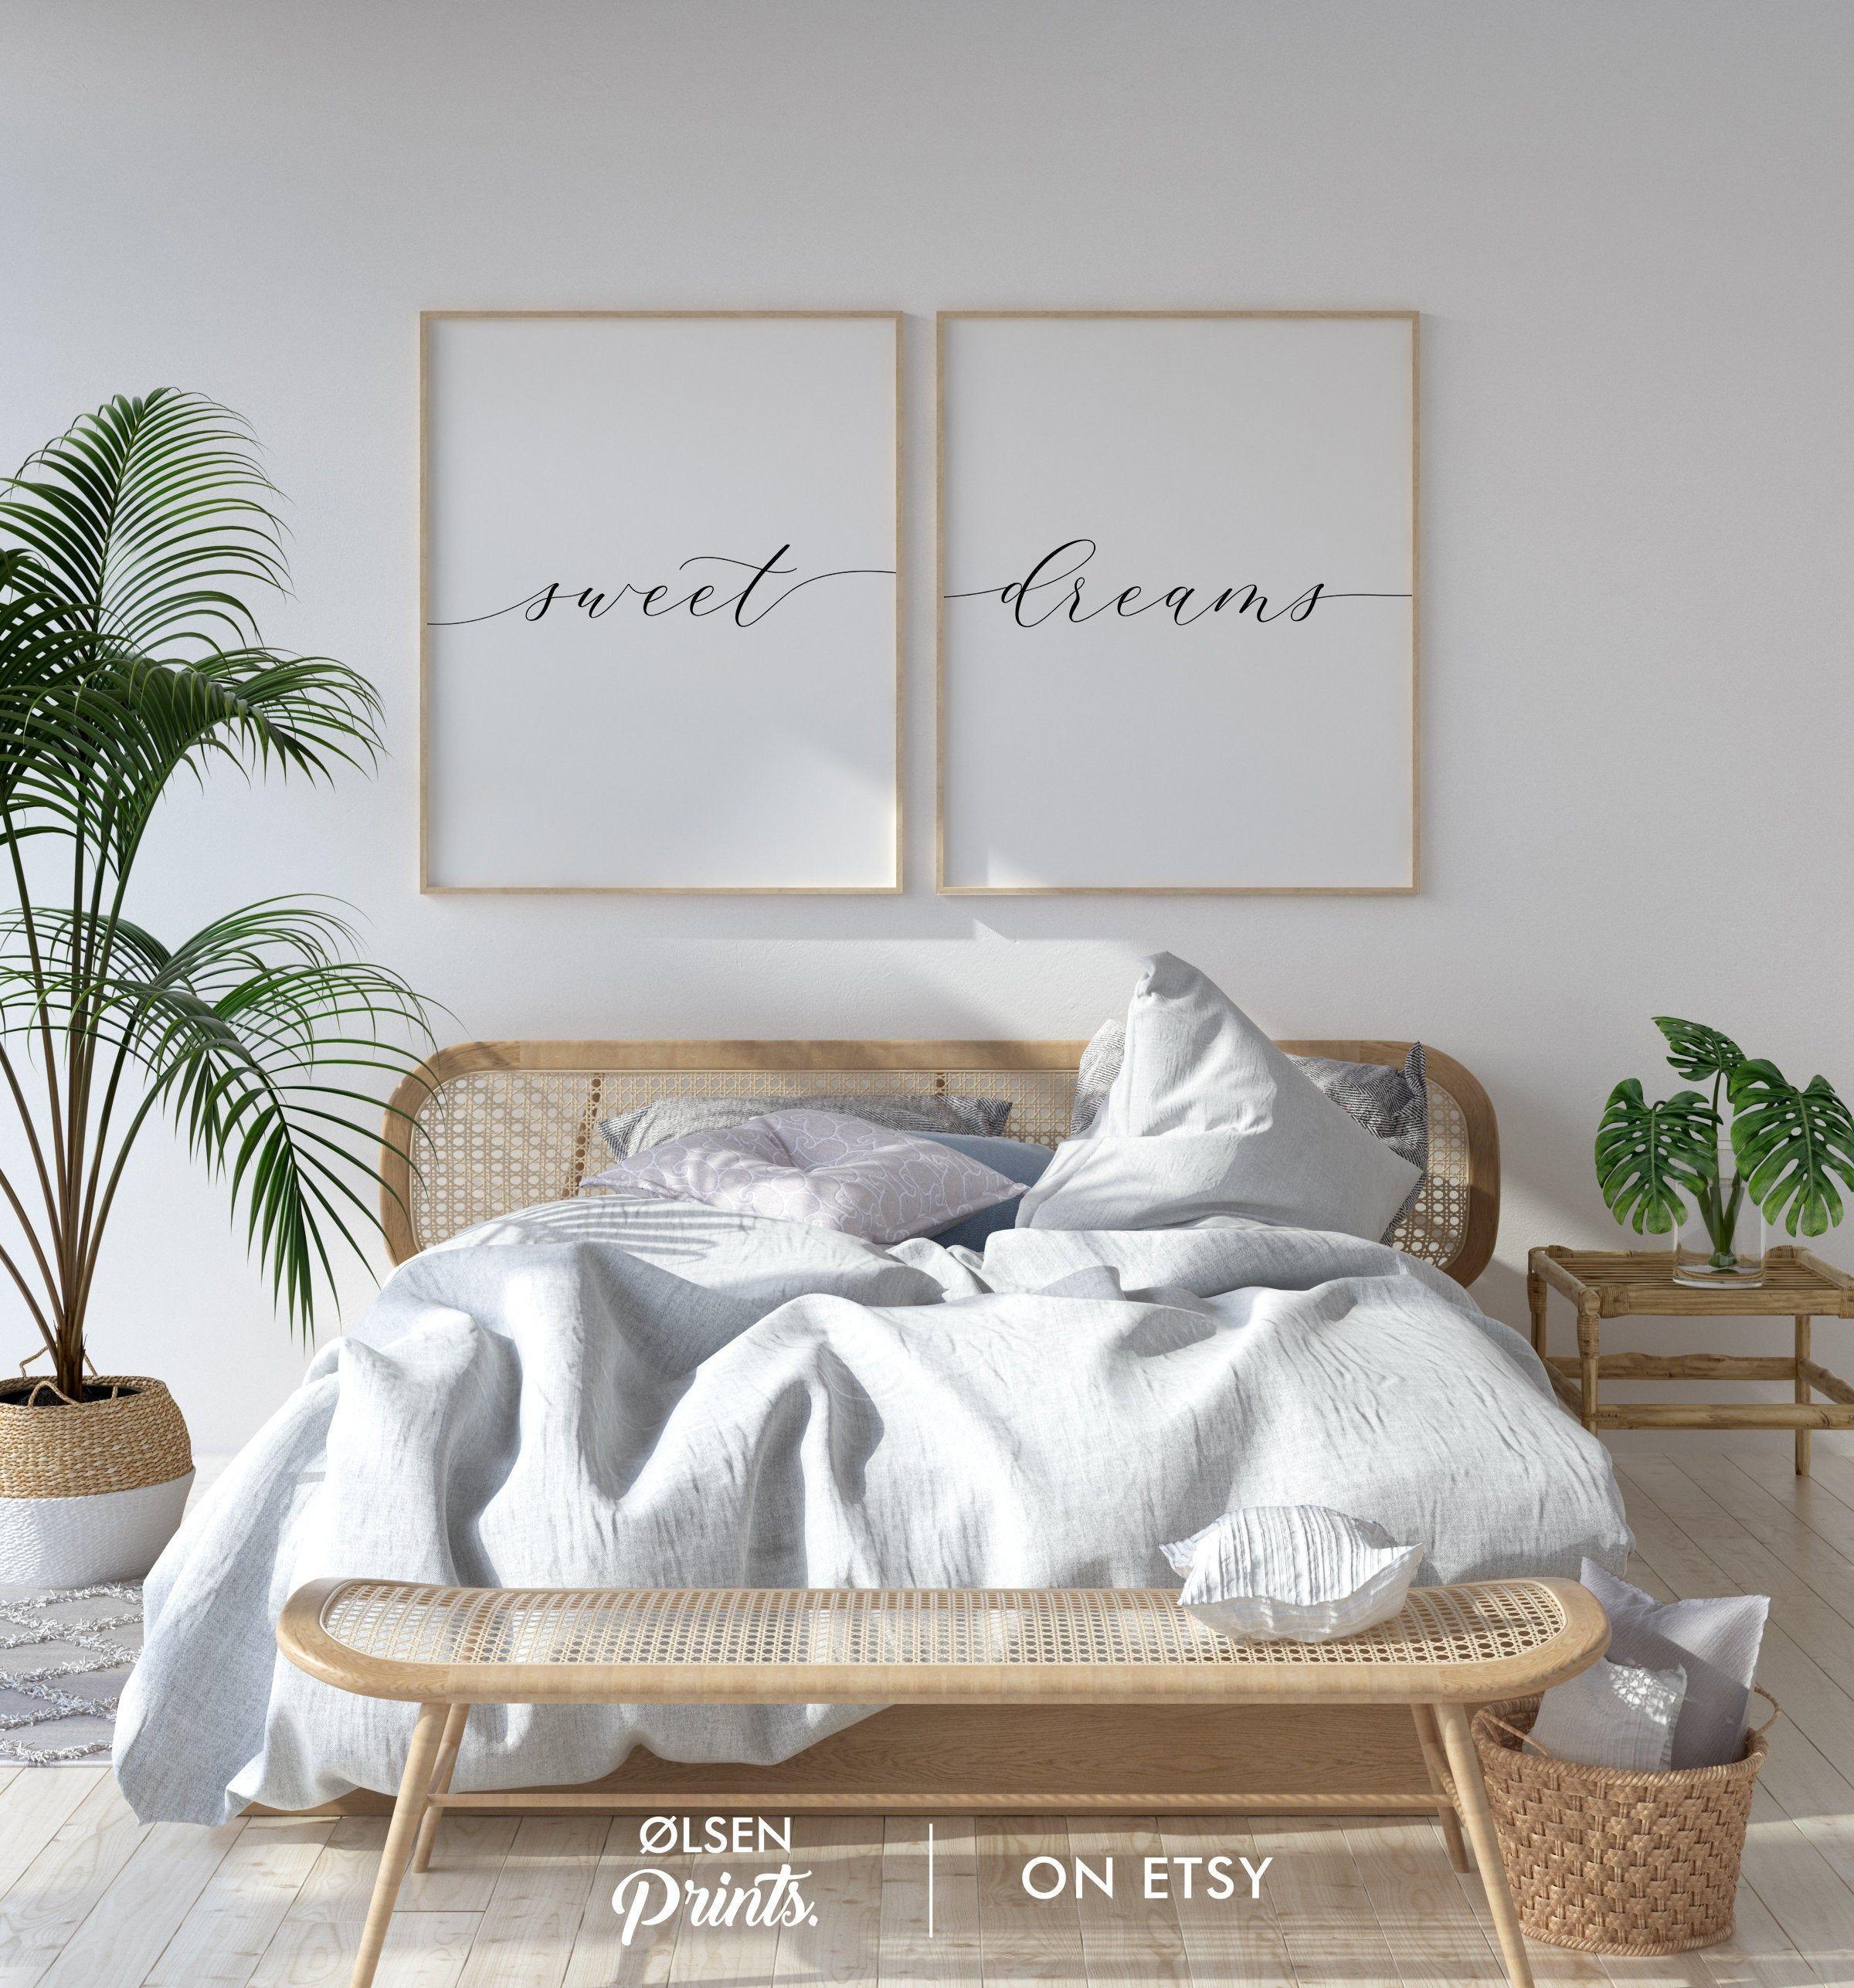 Sweet Dreams Sign Set Of 2 Prints Womens Bedroom Art Above Etsy In 2020 Guest Room Print Master Bedroom Wall Art Wall Decor Bedroom